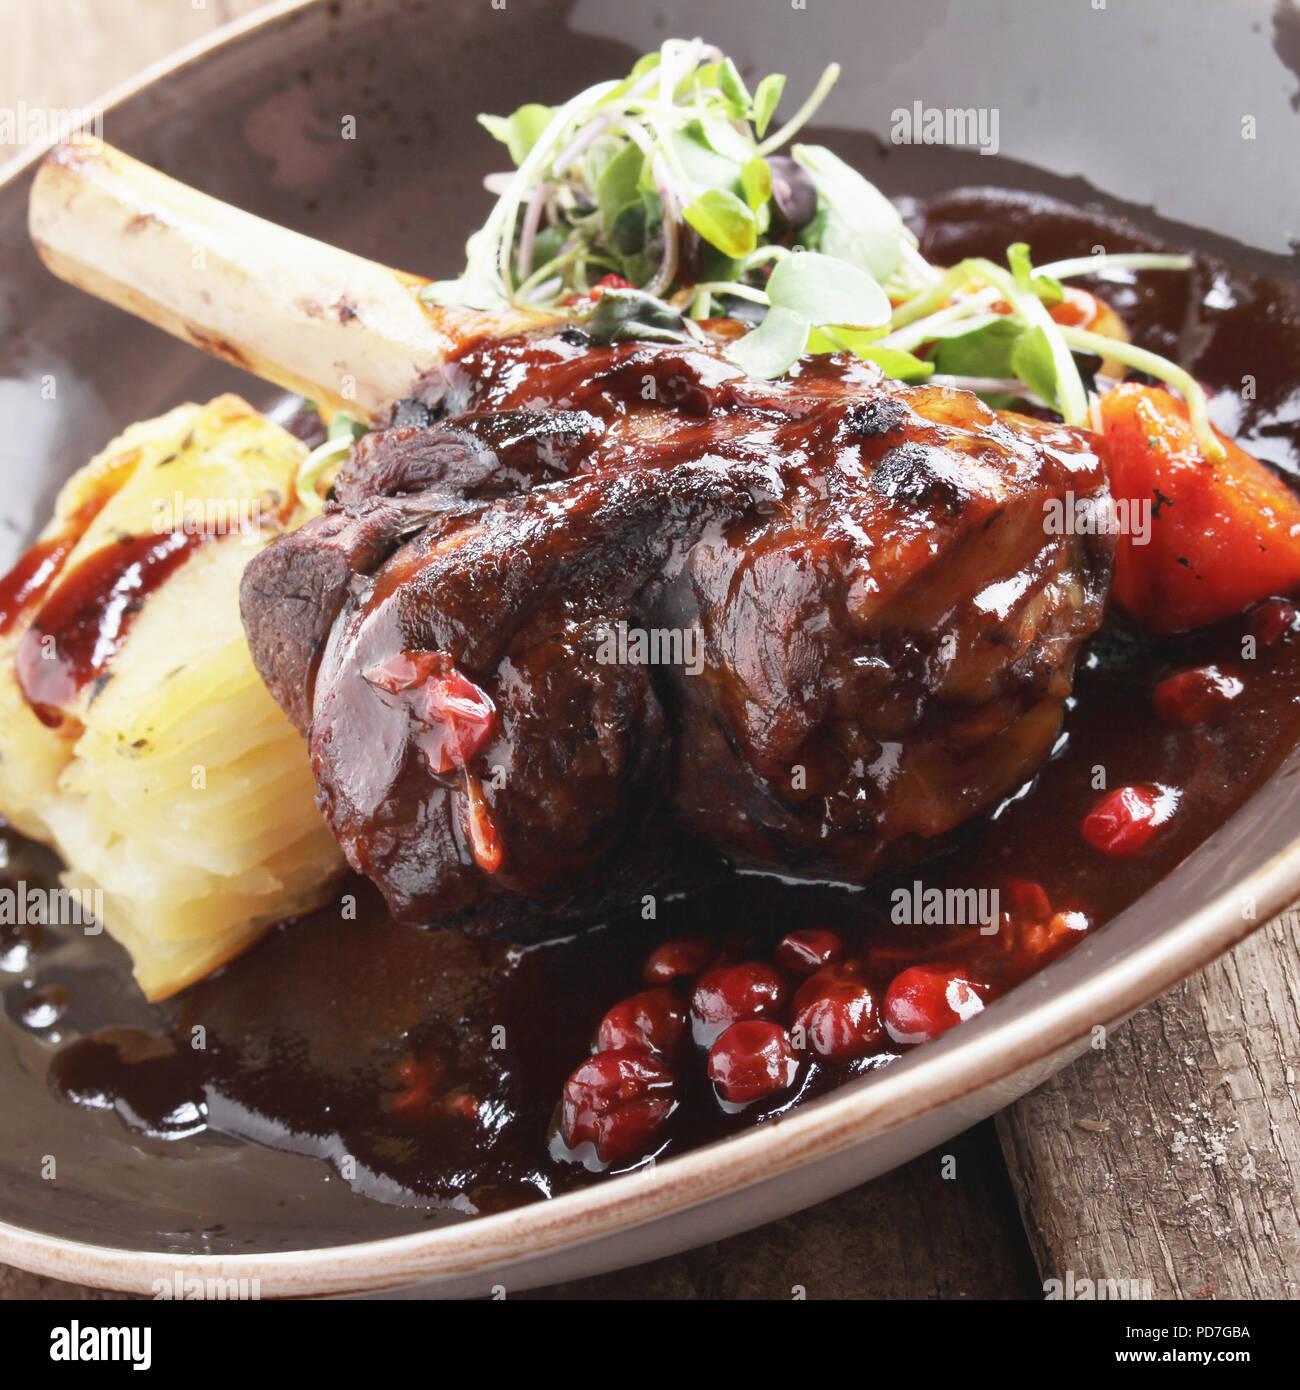 plated lamb main meal - Stock Image